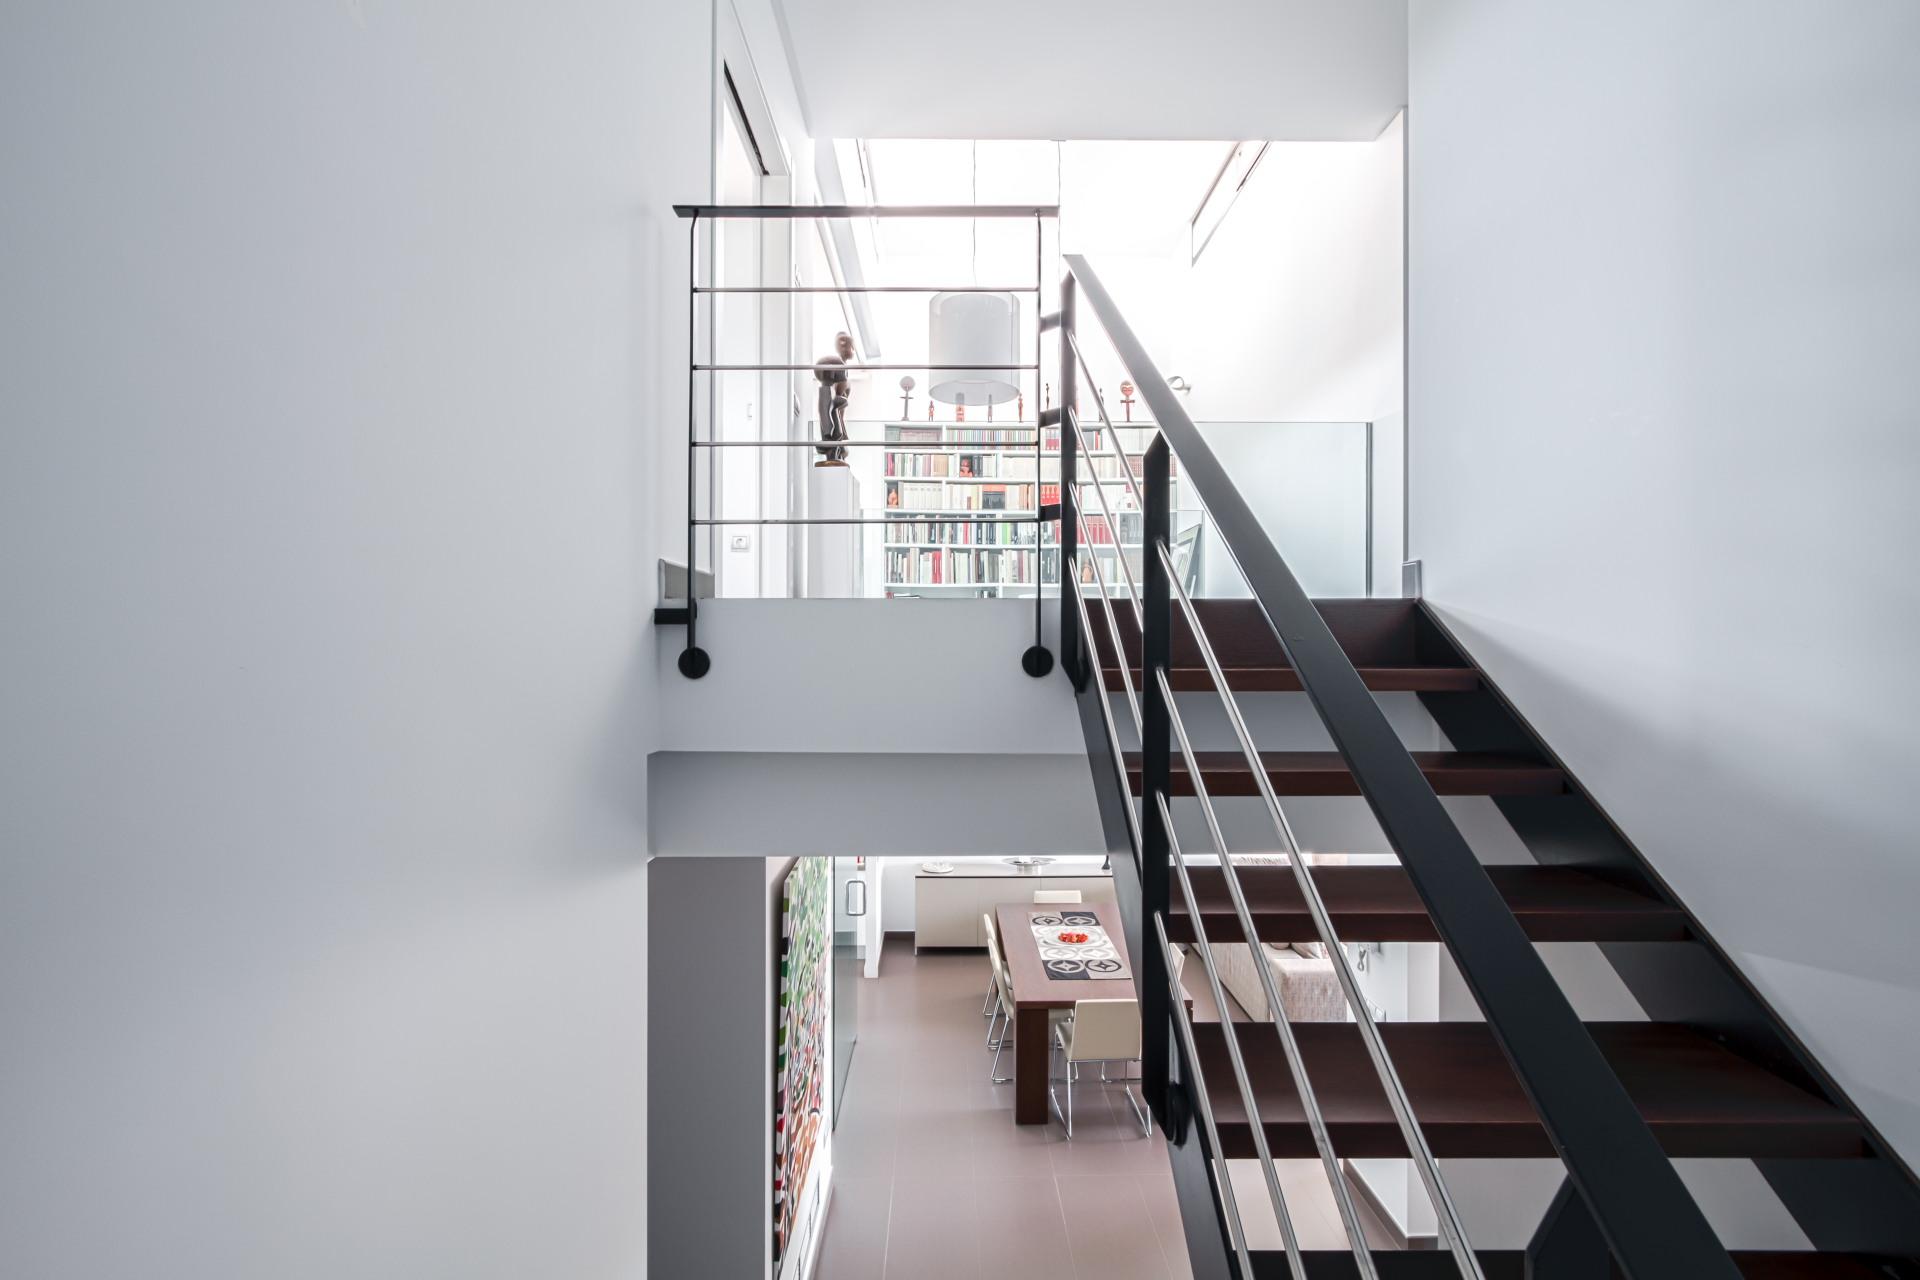 fotografia-arquitectura-valencia-german-cabo-viraje-v02 (13)